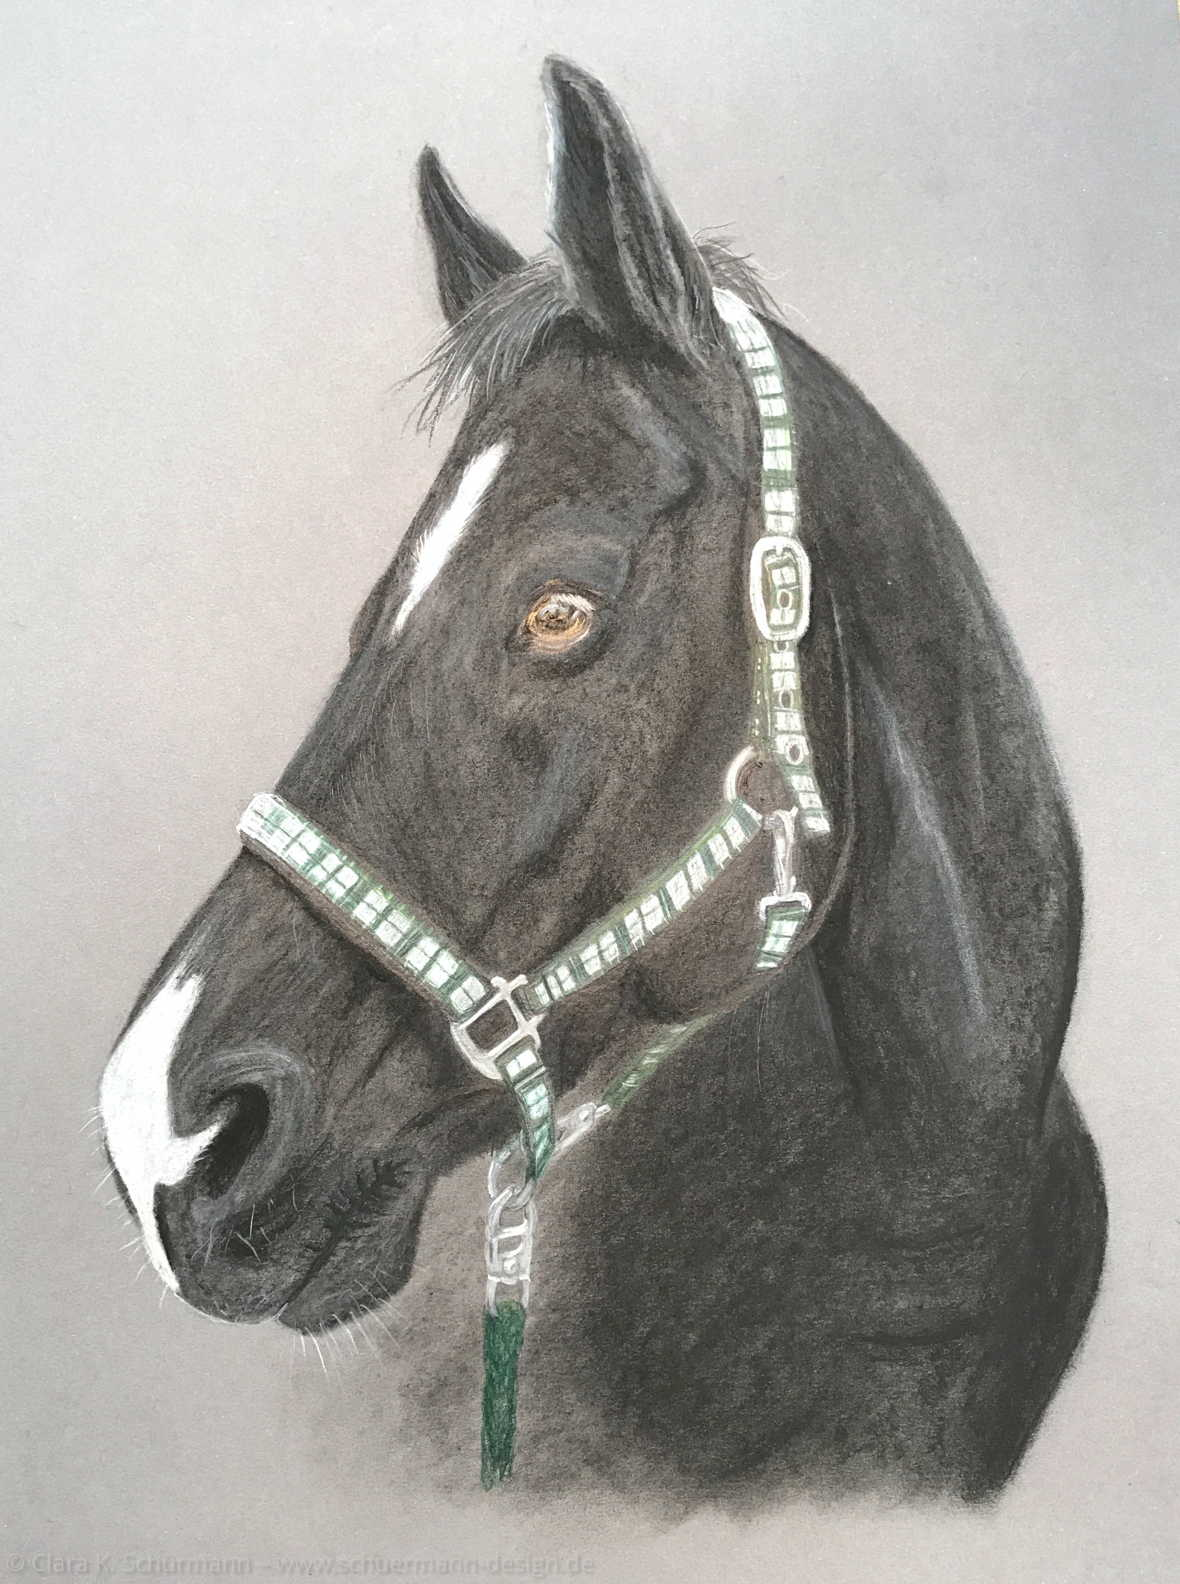 Pferd Herr Lönneberga